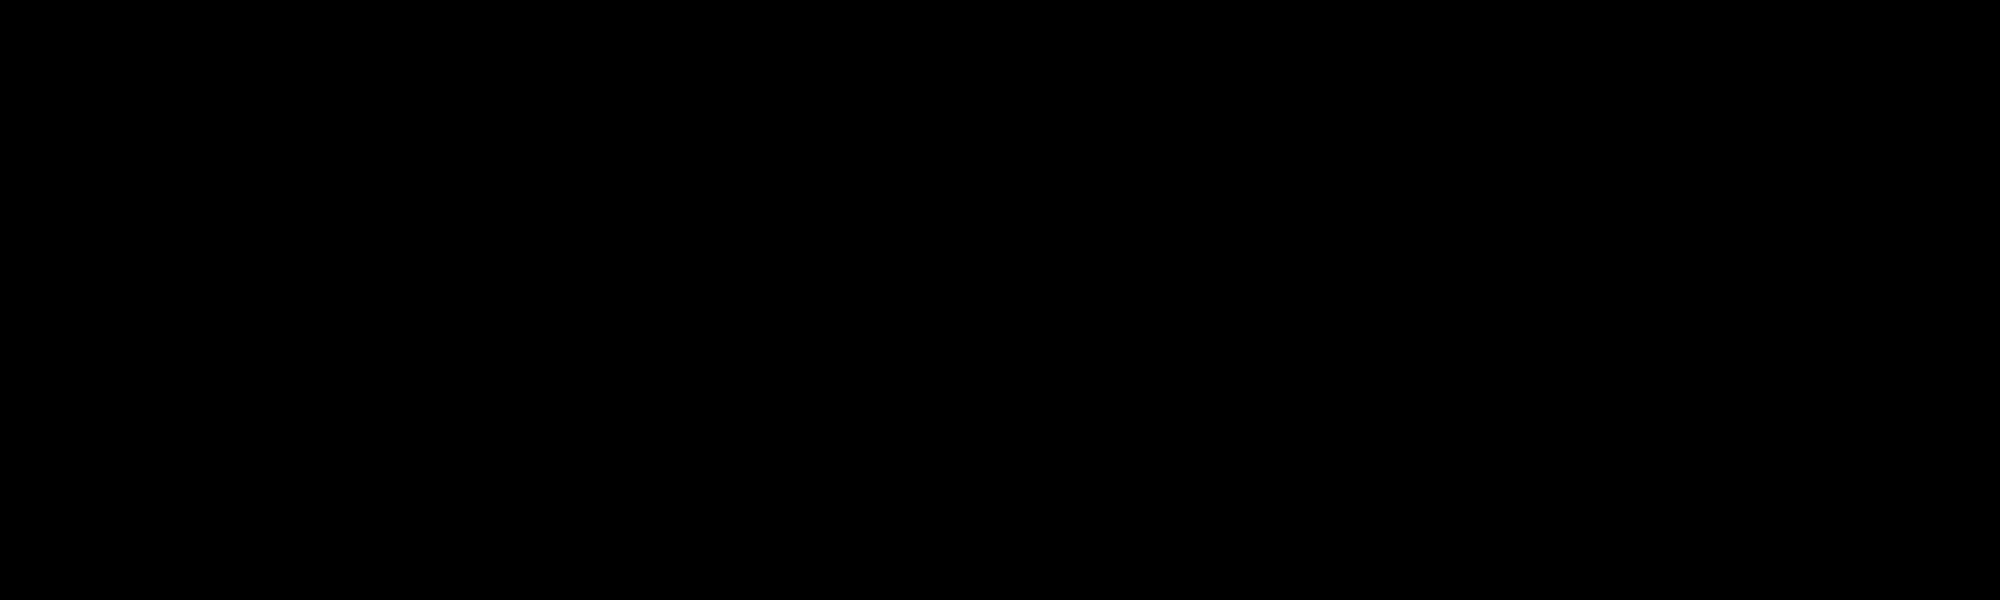 Unihoc Floorball